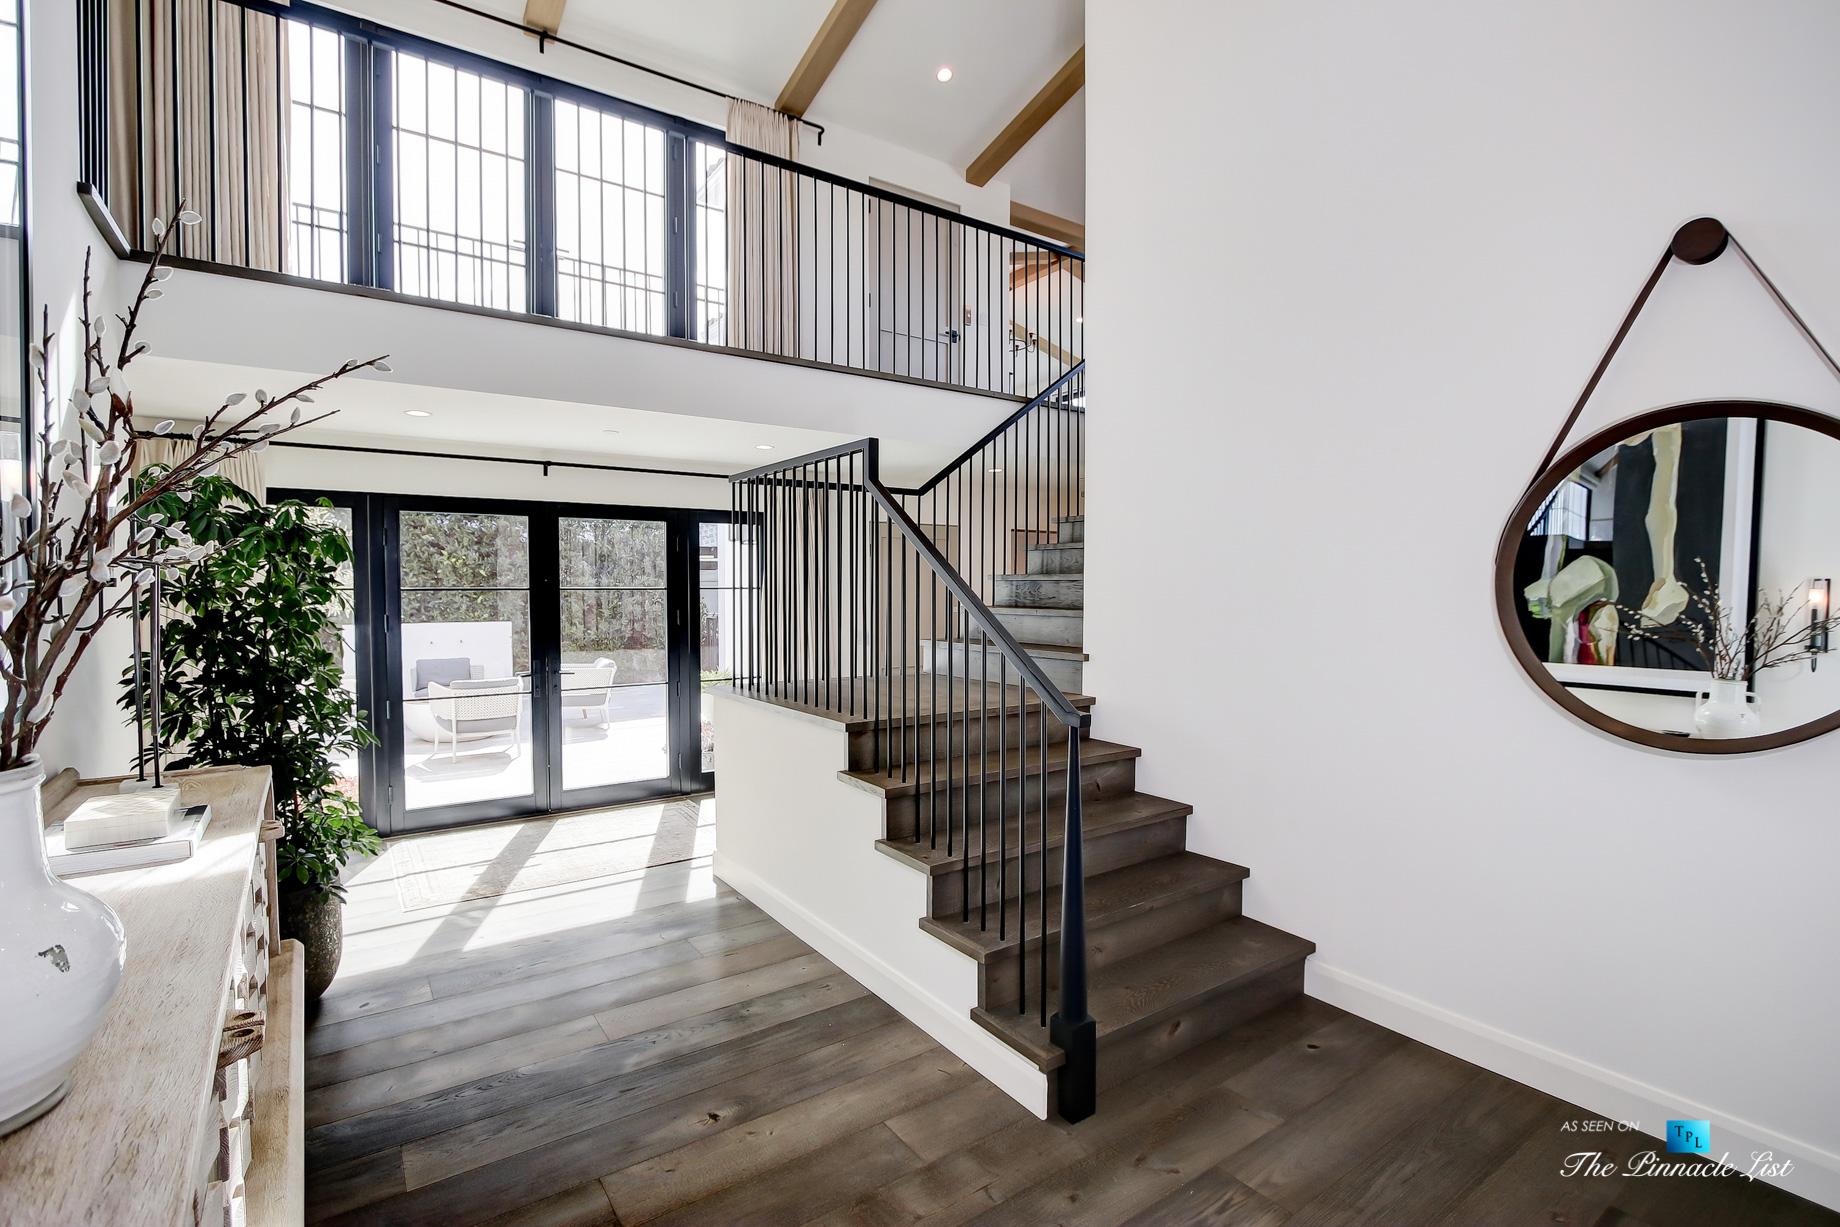 825 Highview Ave, Manhattan Beach, CA, USA – Private Exterior Courtyard View – Luxury Real Estate – Modern Spanish Home